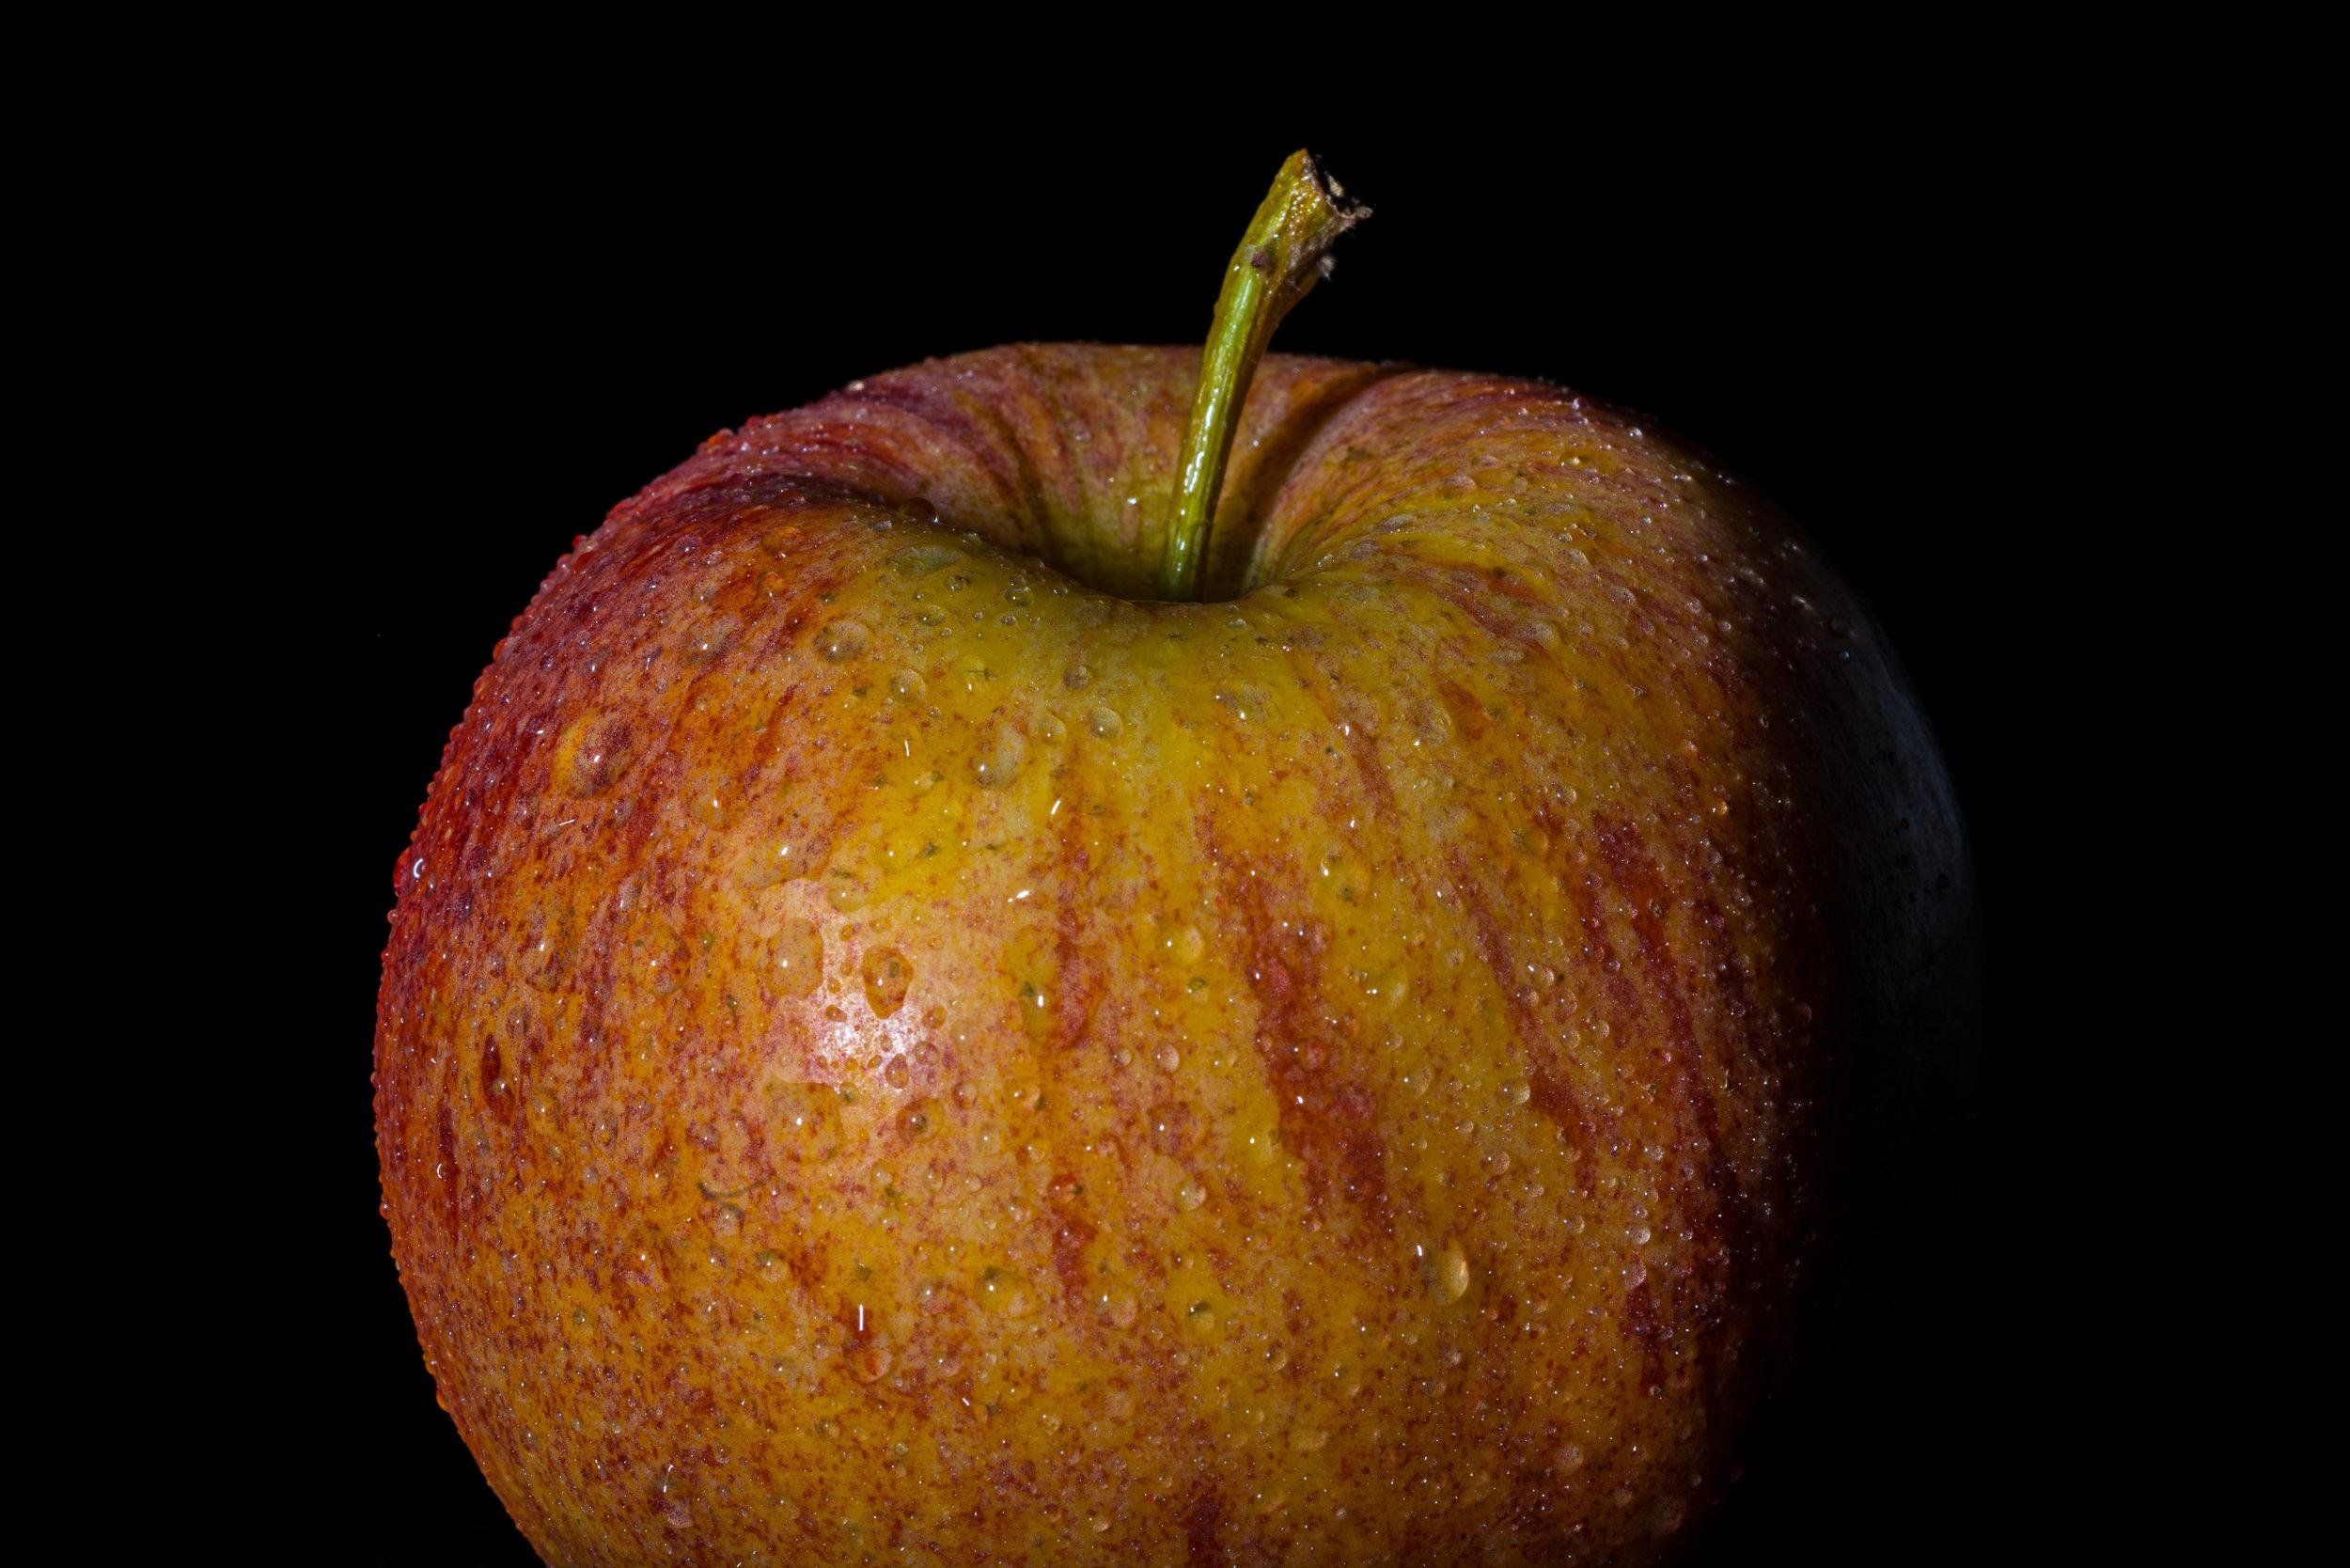 A slightly wet apple  90mm f20, 1/200 secs